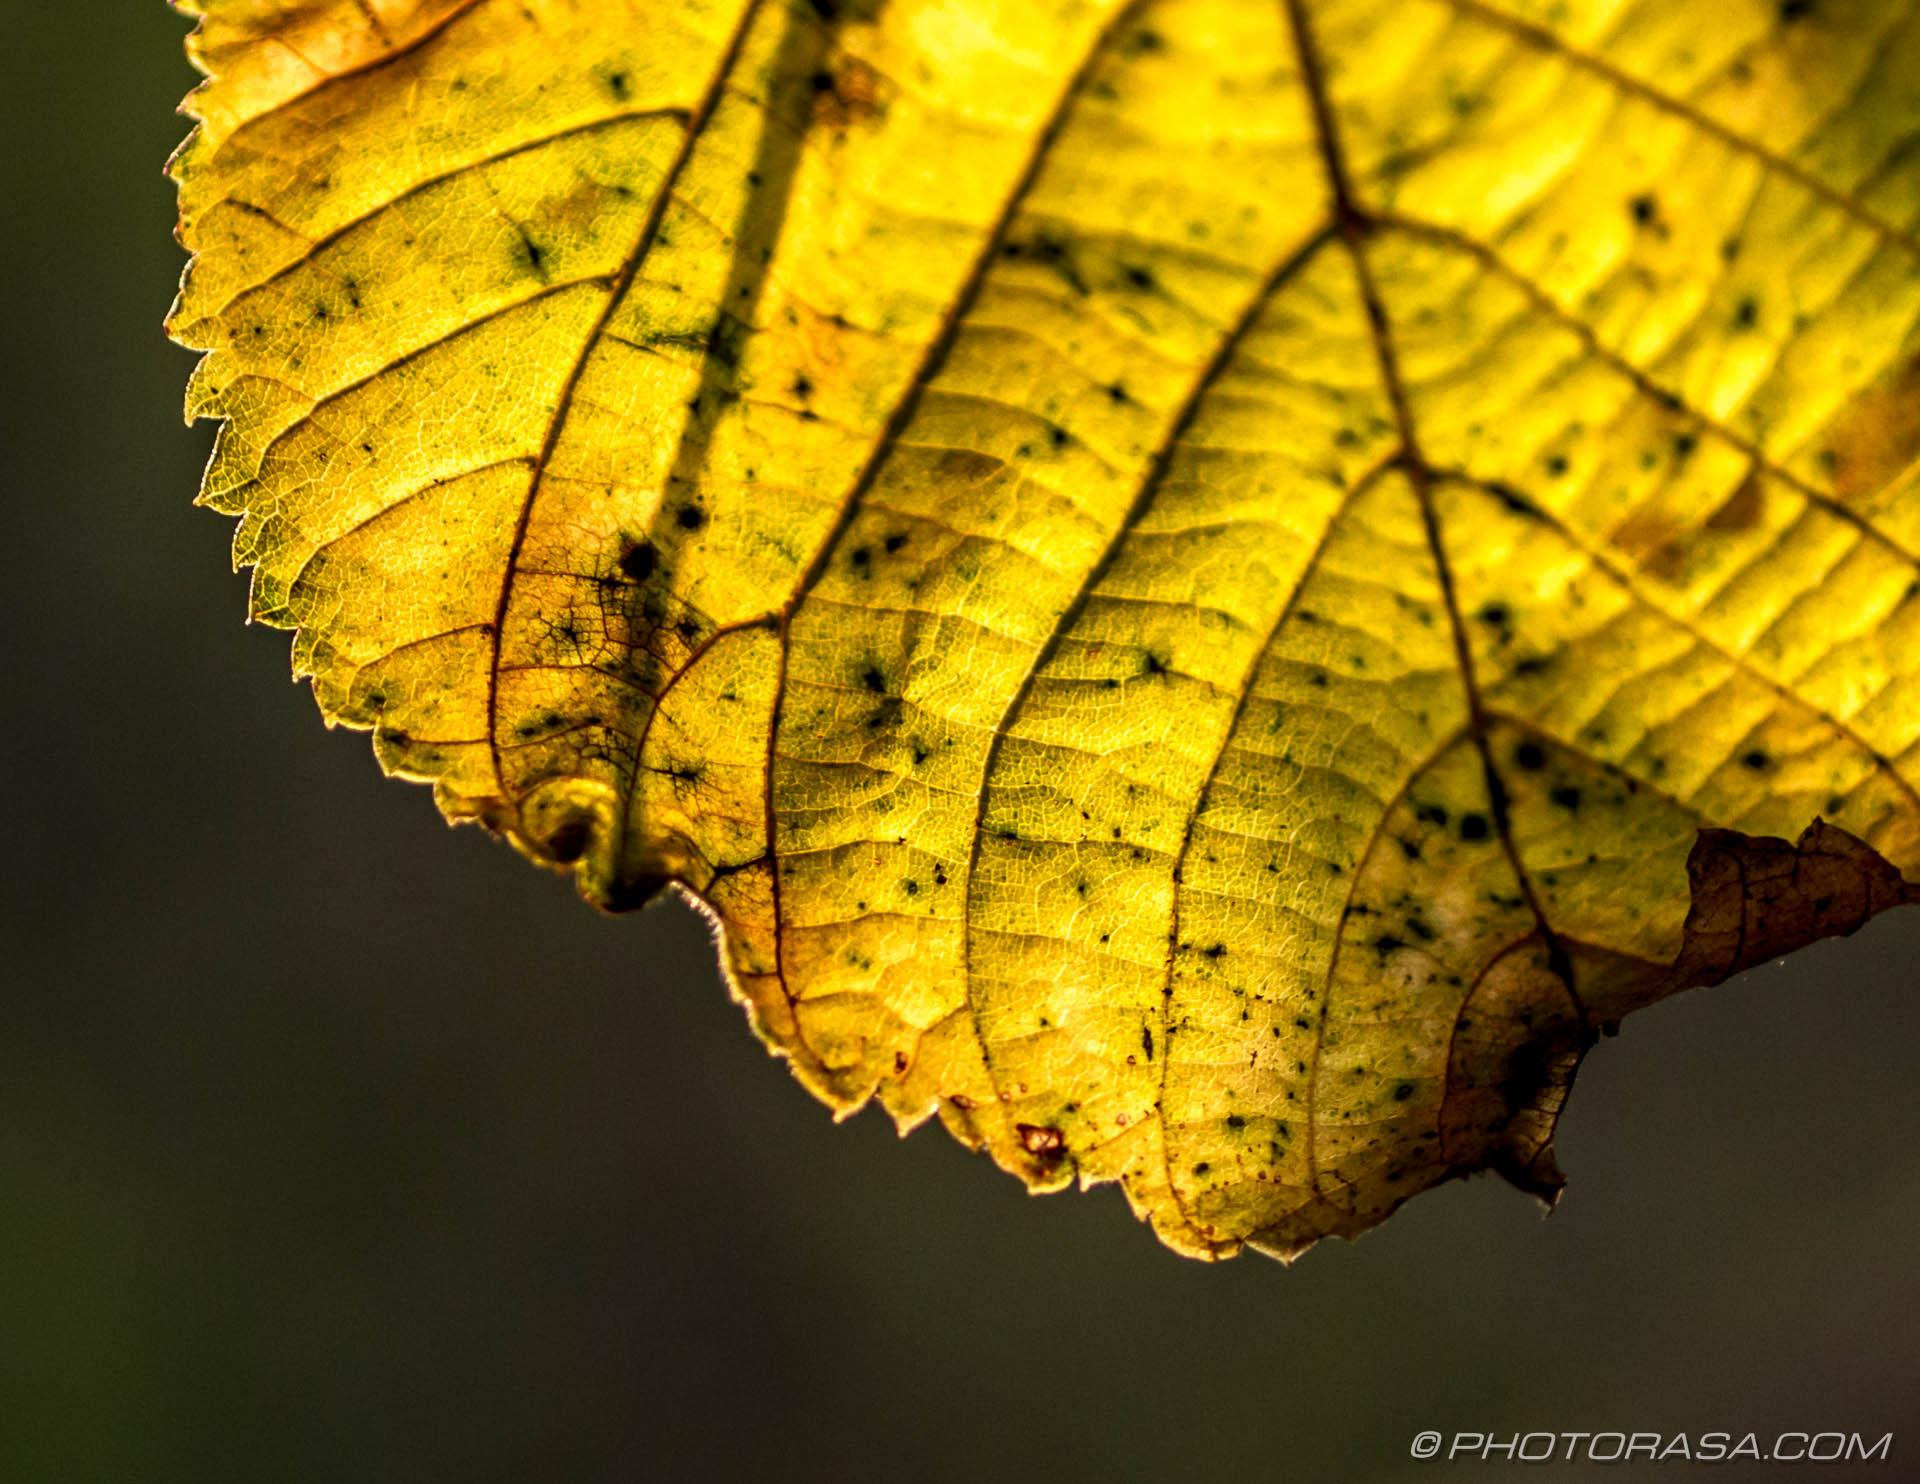 http://photorasa.com/autumn-leaves/yellow-autumn-leaf-close-up/